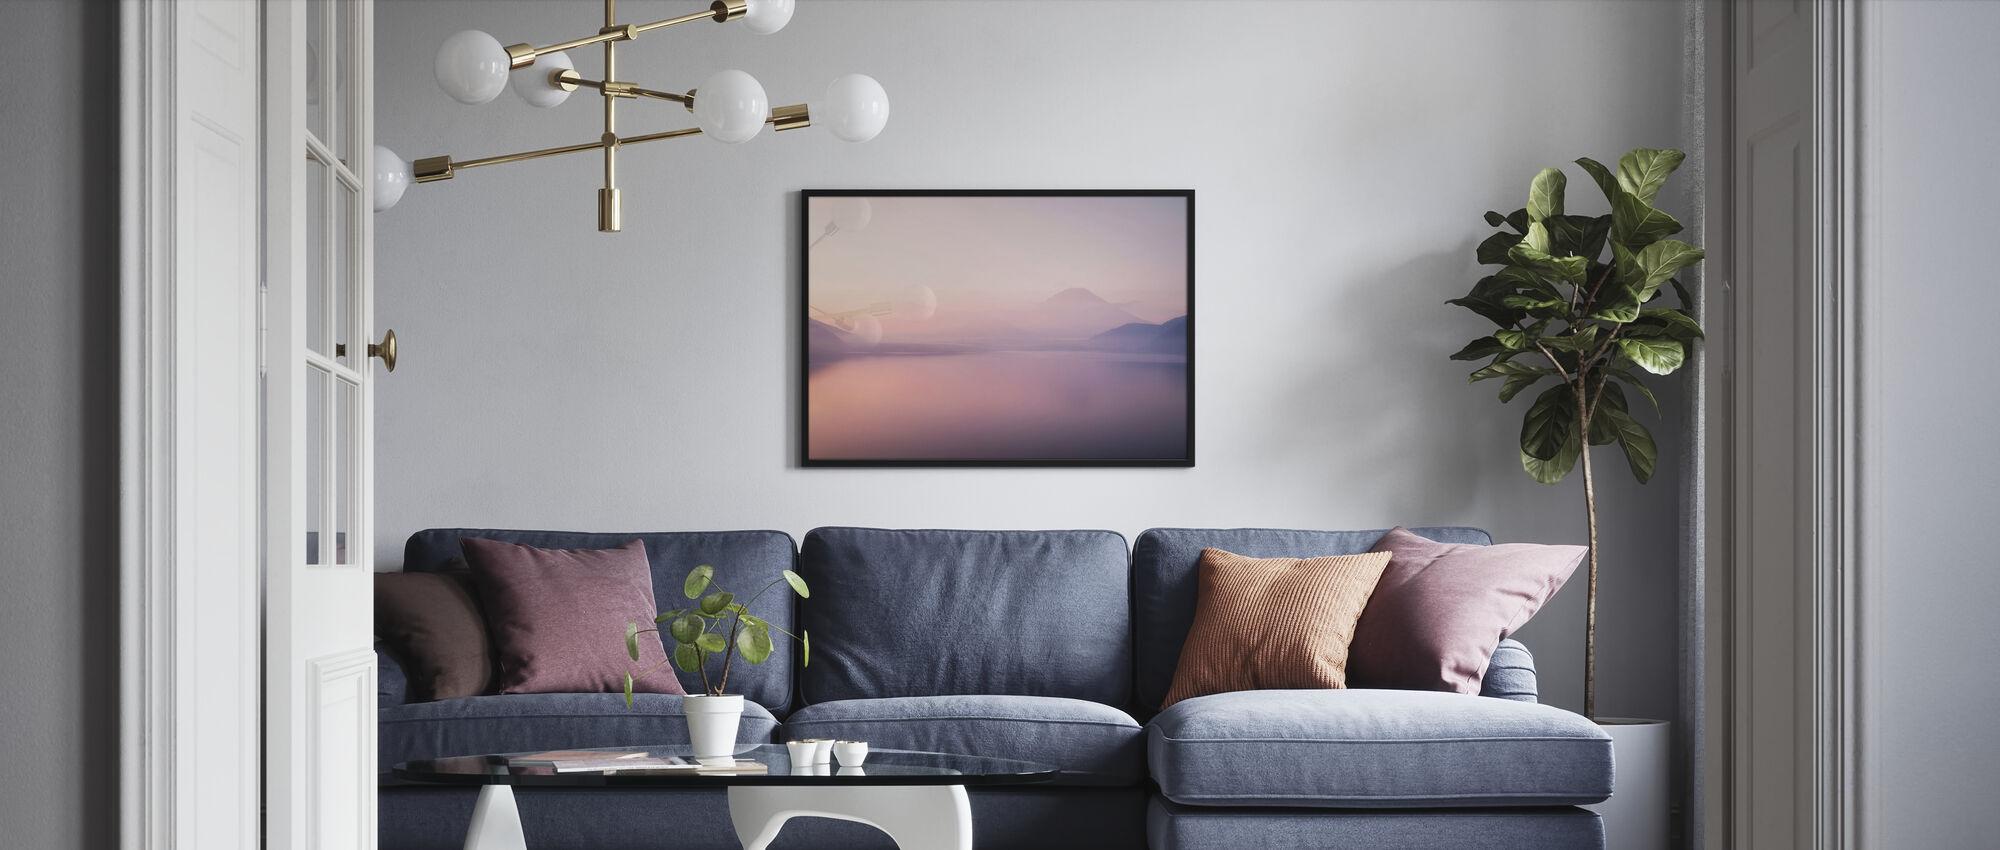 Mt. Fuji over a Foggy Lake - Poster - Living Room